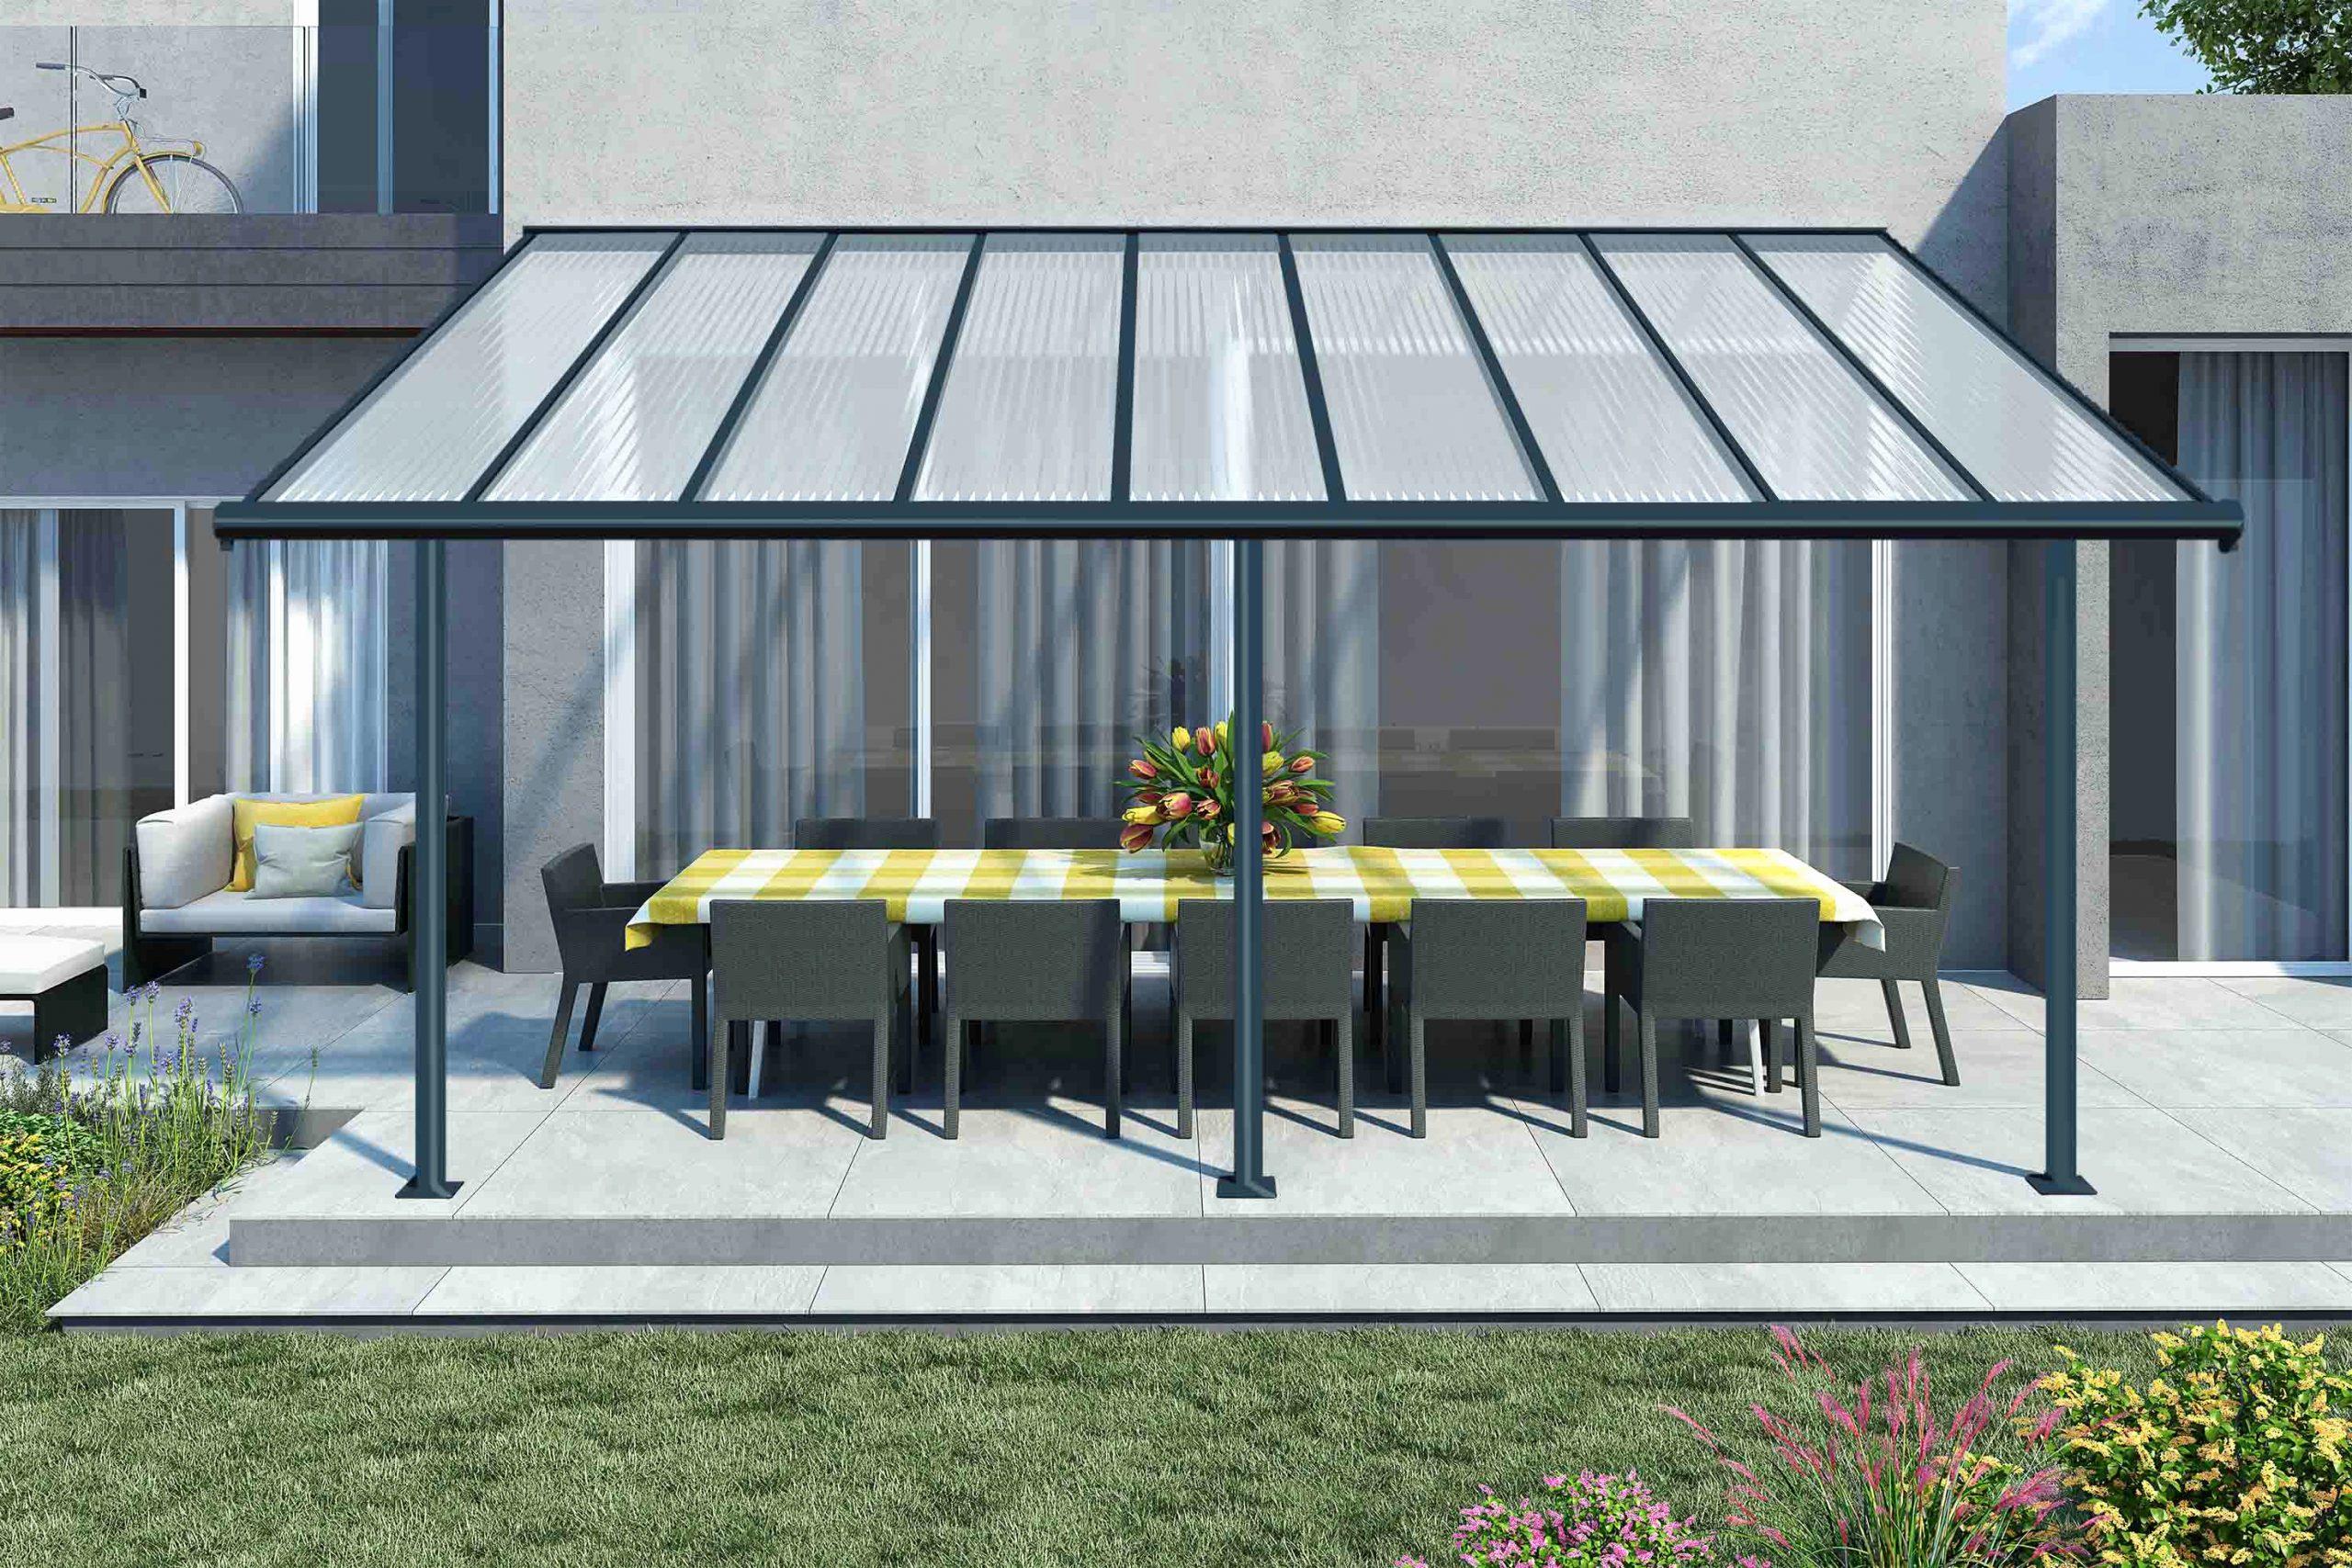 Frais Pergola Aluminium Toile Retractable Conception De ... concernant Pergola Castorama Jardin